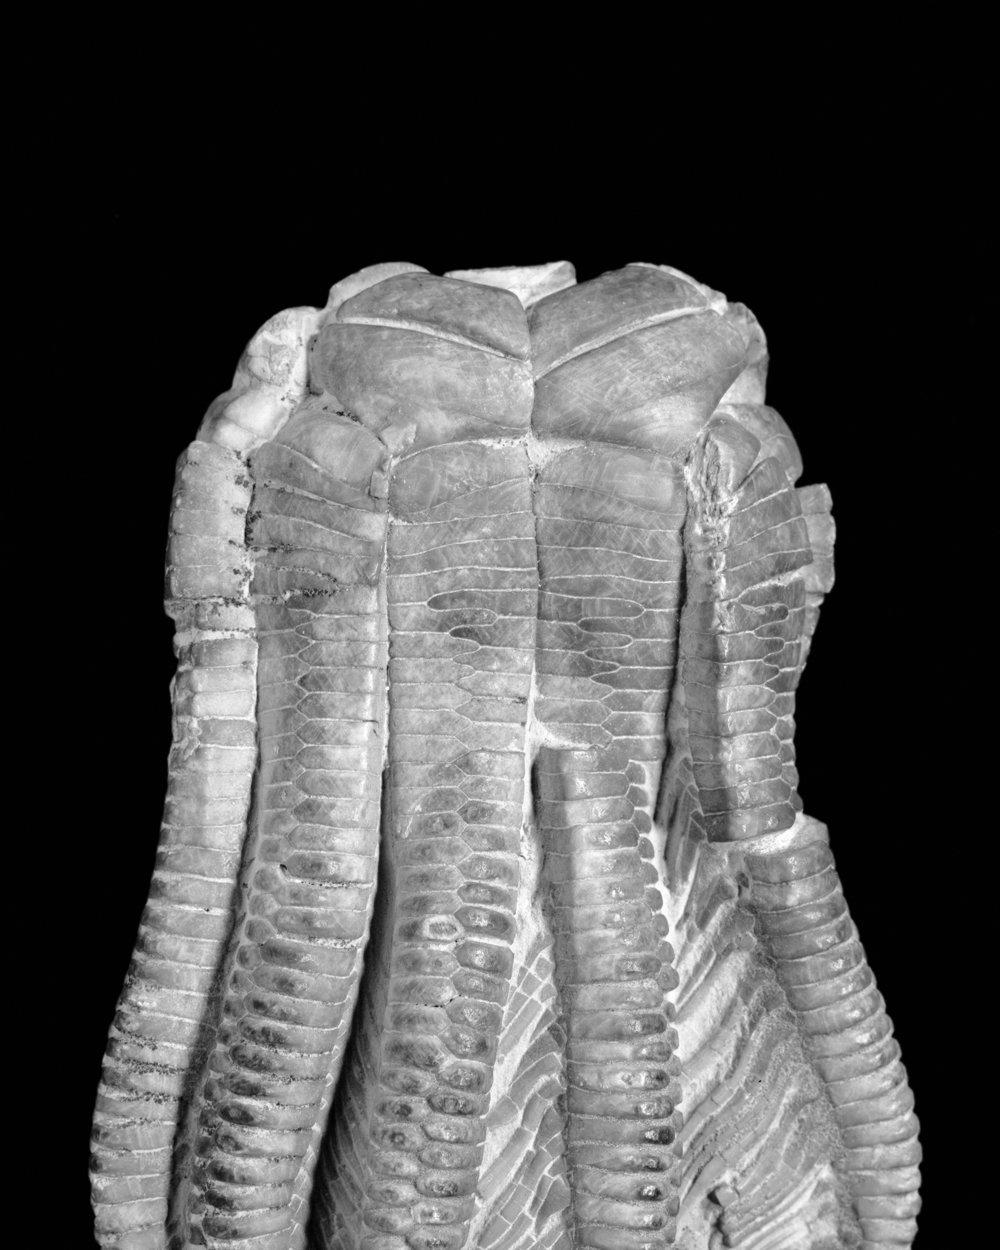 Encrinus liliforms